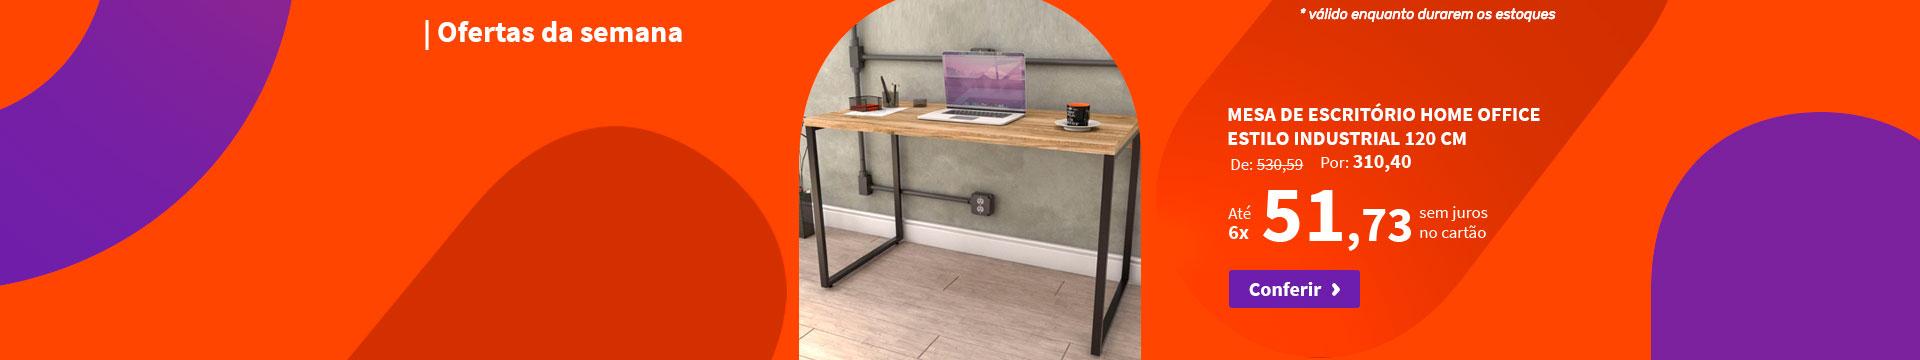 Mesa de Escritório Home Office Estilo Industrial 120 cm - Ofertas da semana